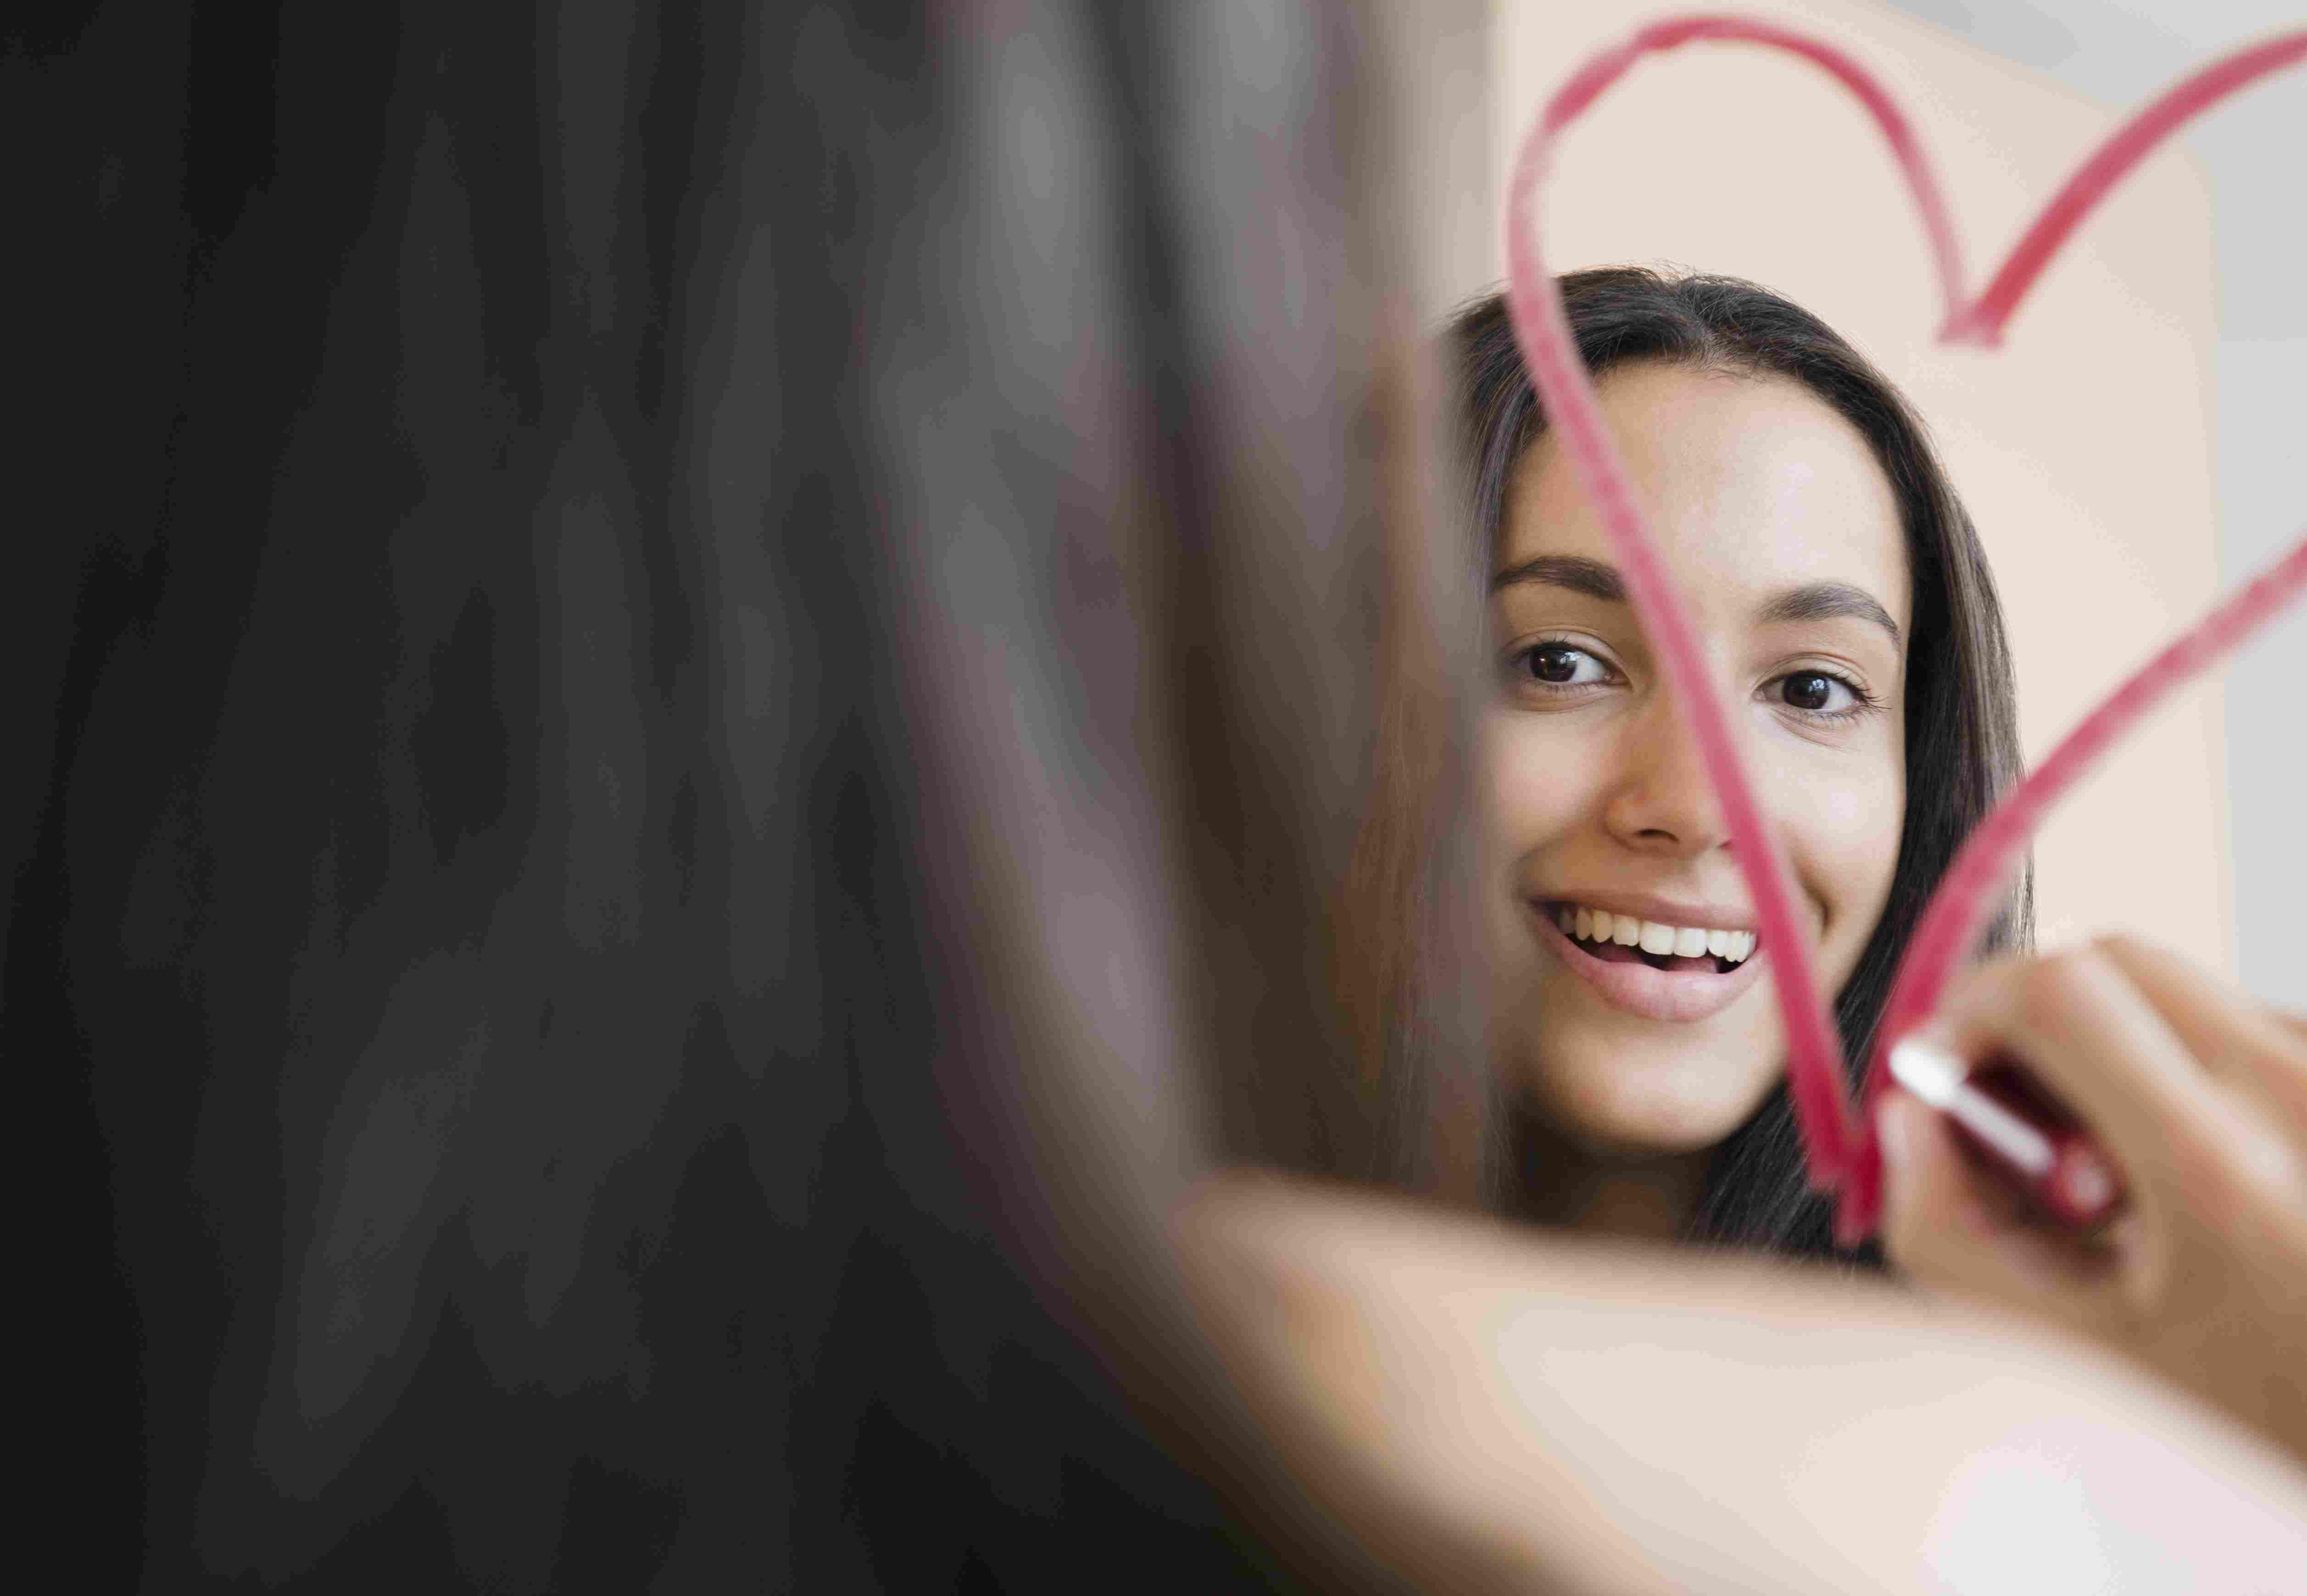 Hispanic teenager drawing heart with lipstick